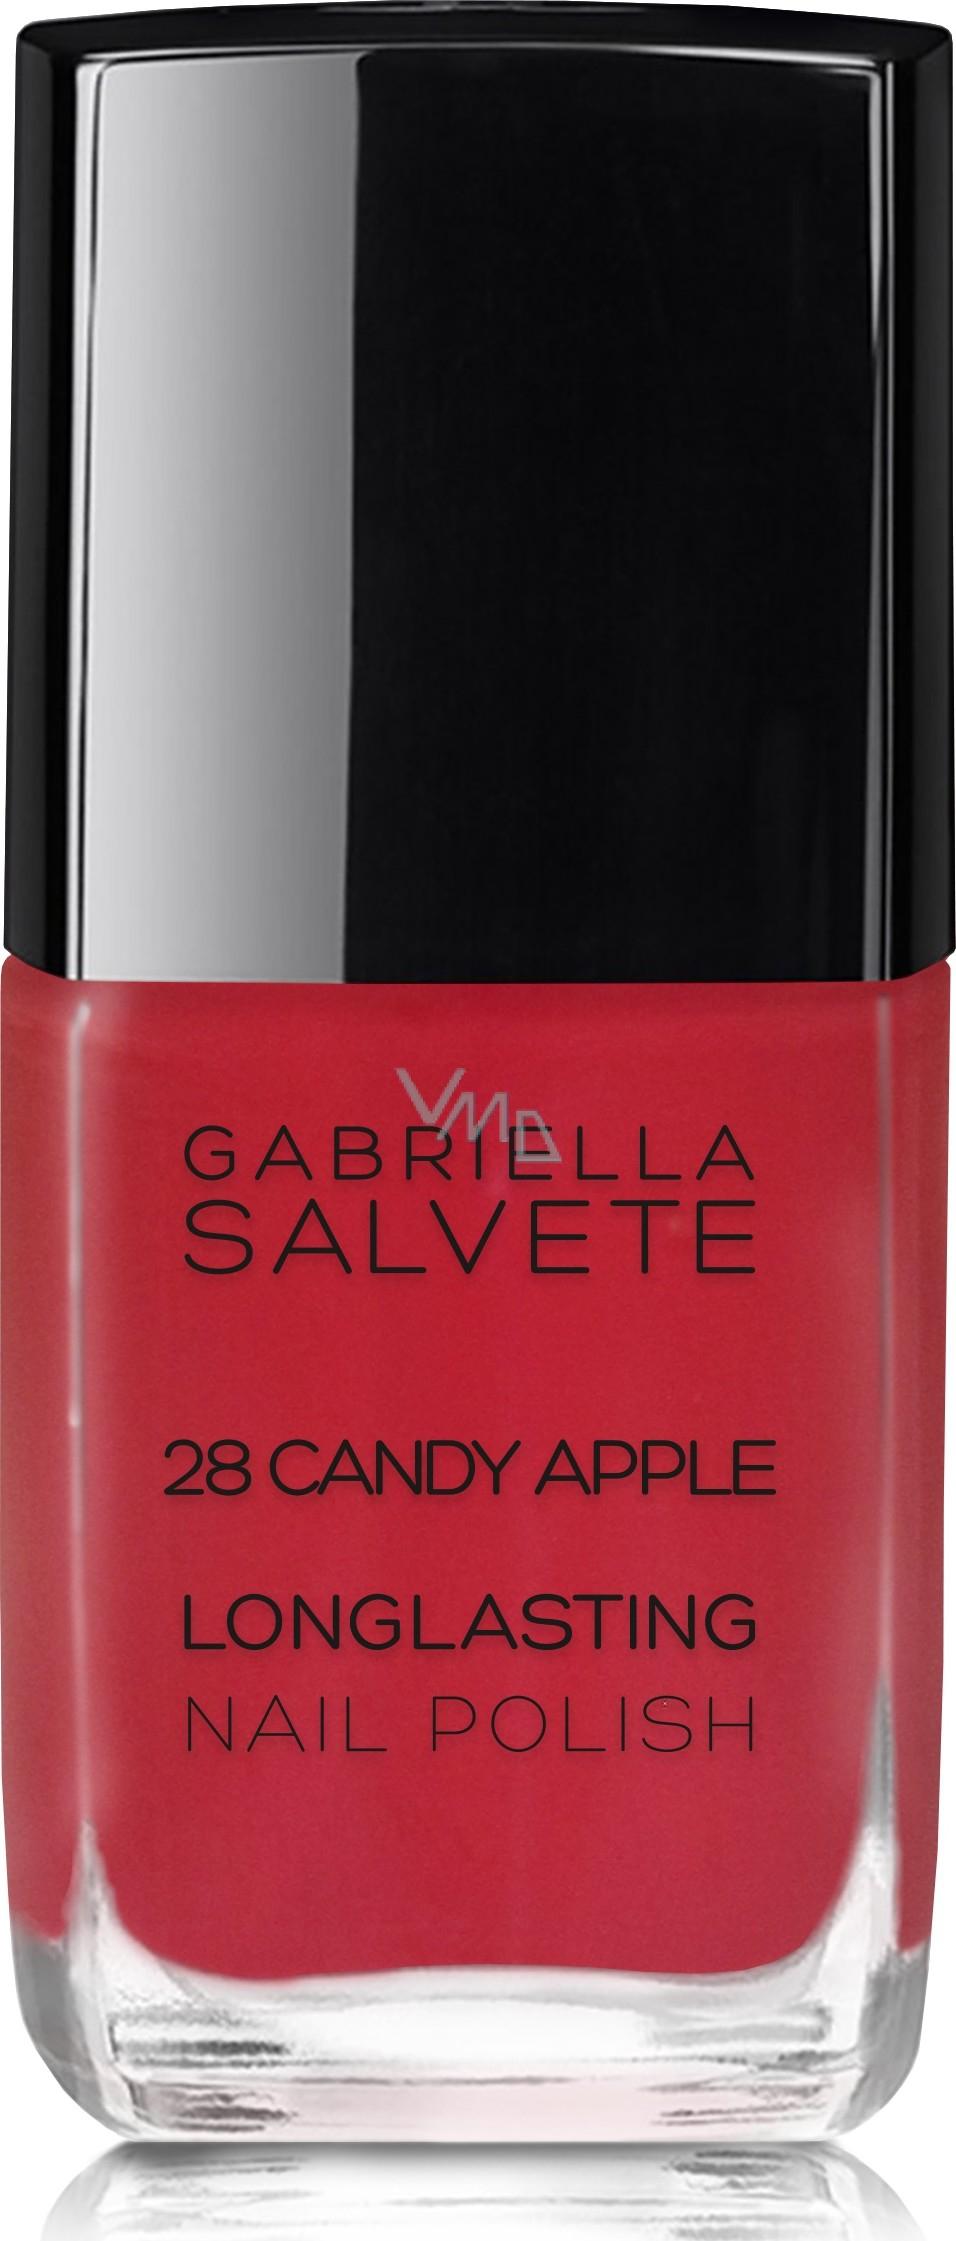 Gabriella Salvete Longlasting Enamel Dlouhotrvajici Lak Na Nehty S Vysokym Leskem 28 Candy Apple 11 Ml Vmd Drogerie A Parfumerie